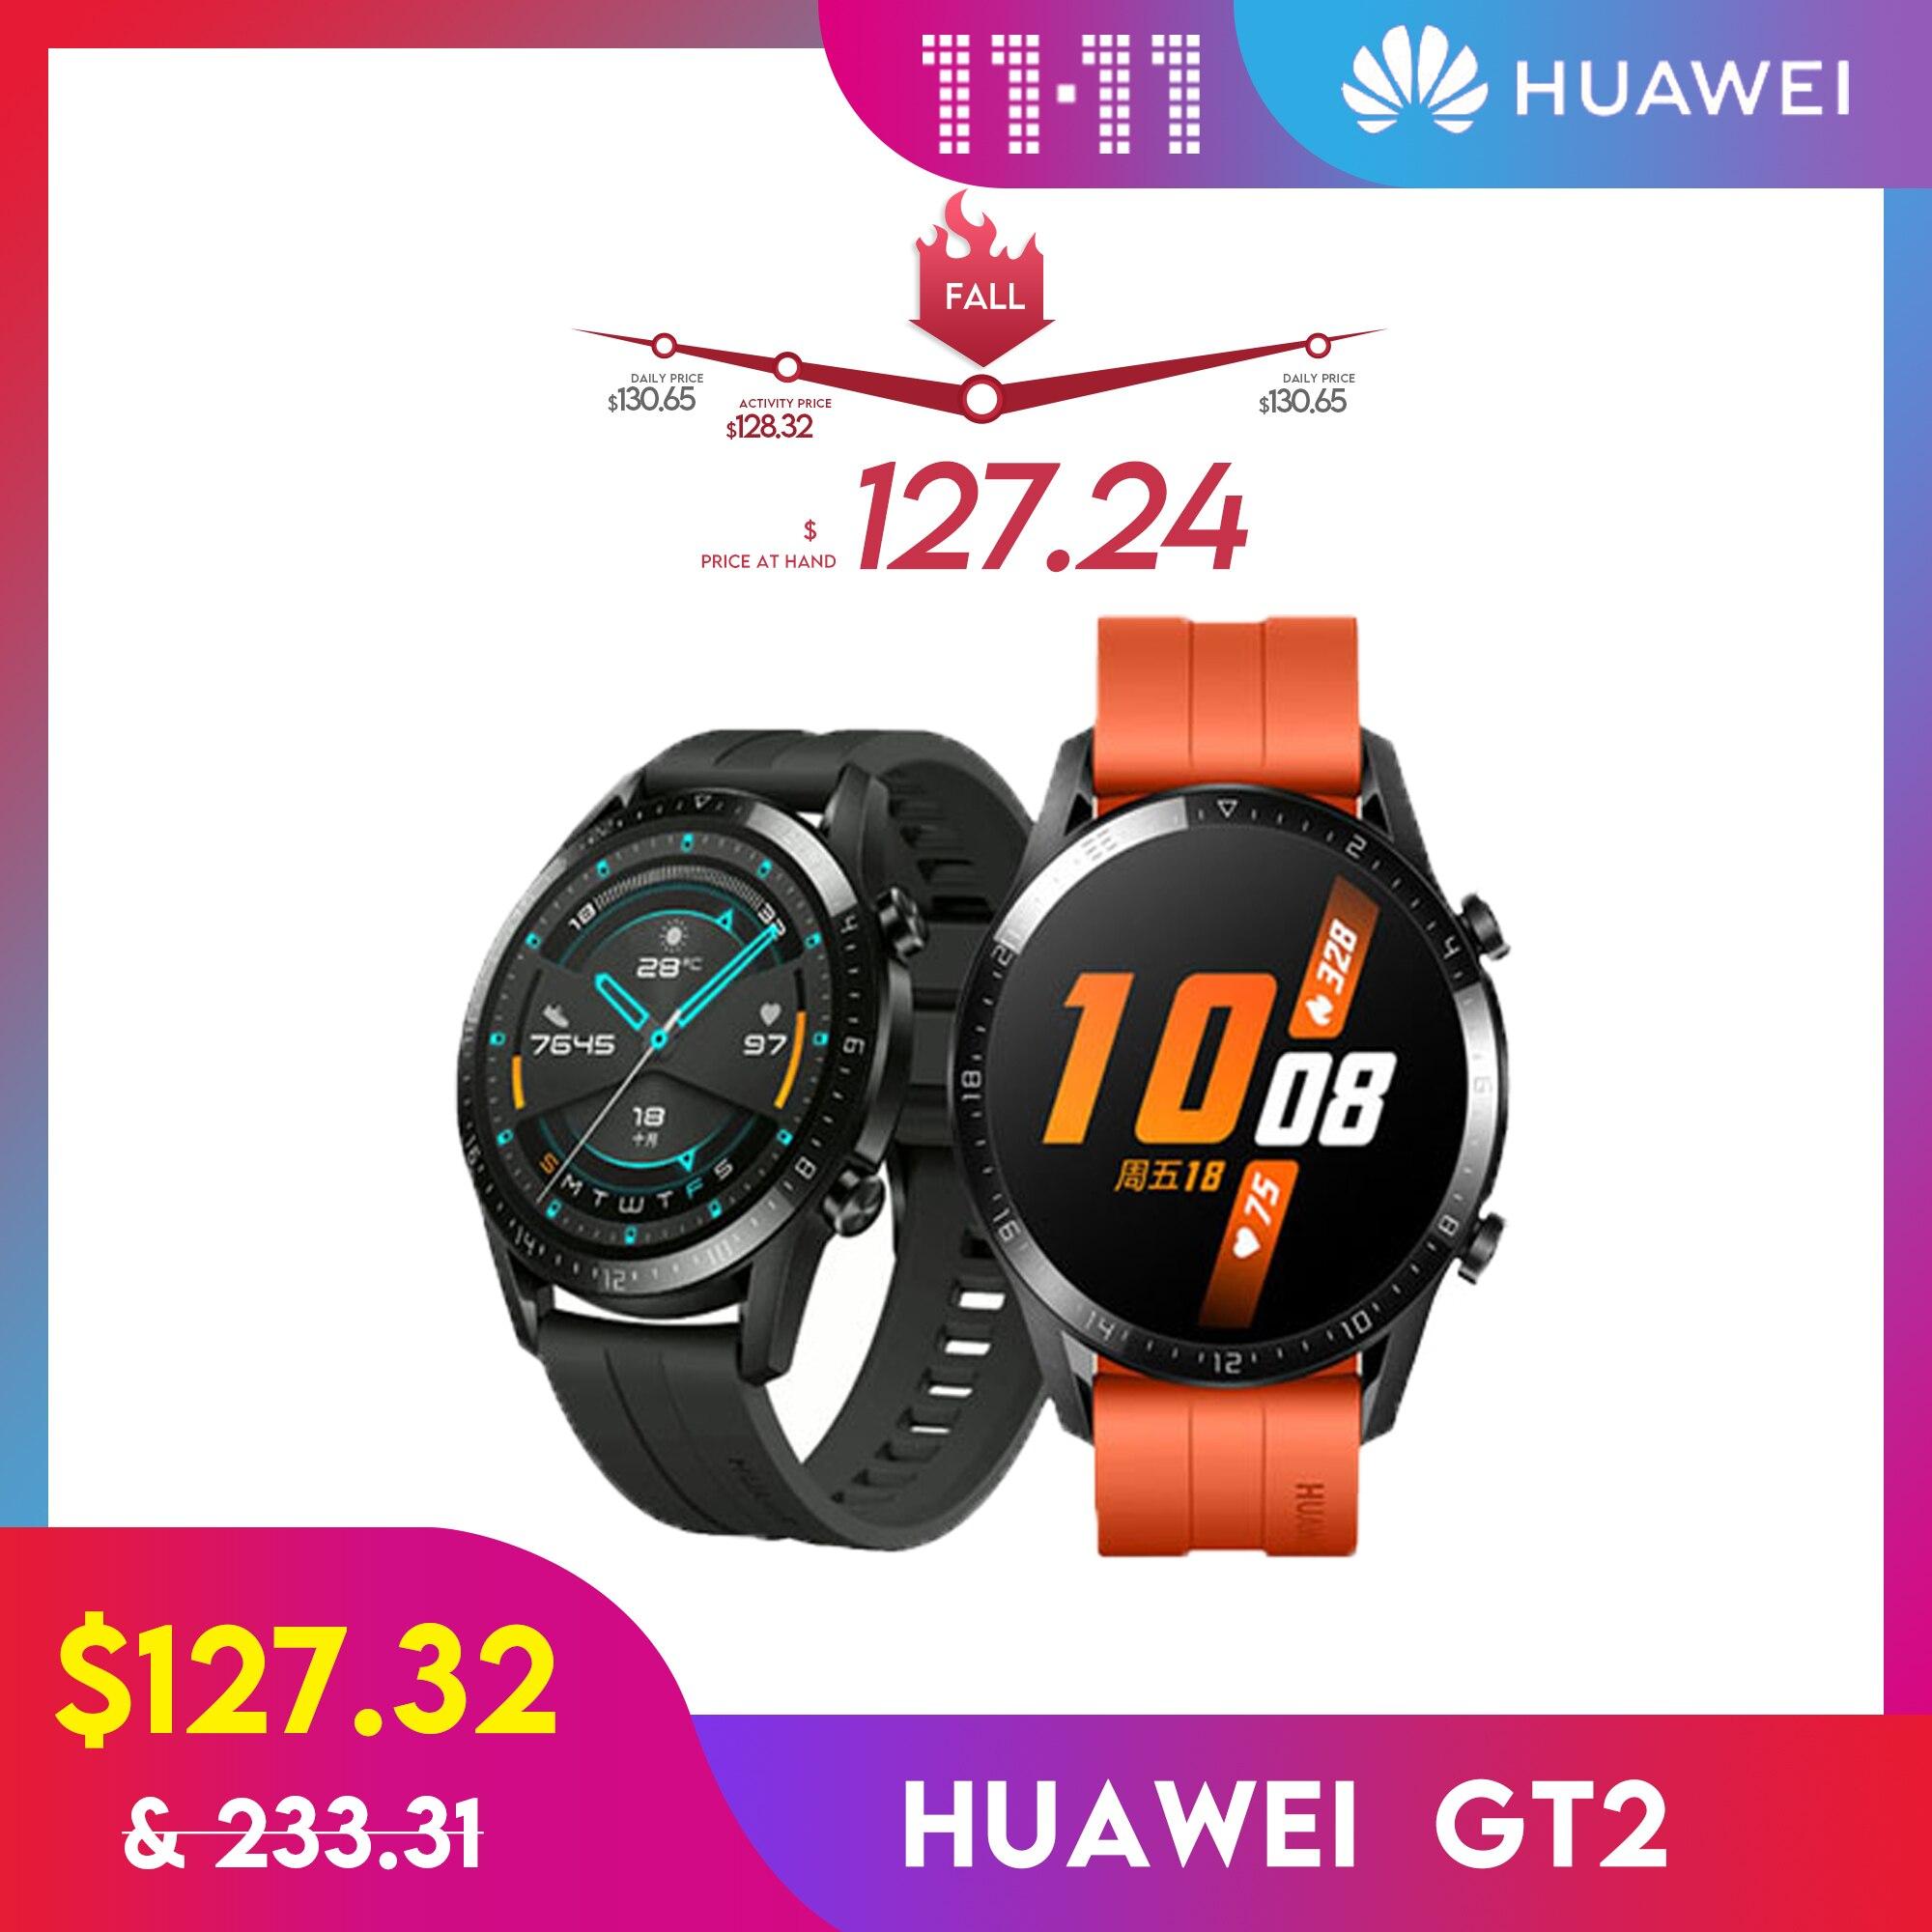 HUAWEI GT2 Smartwatch Version mondiale 14 jours GPS appel intelligent Bluetooth oxygène sanguin pour Android iOS en Stock | AliExpress